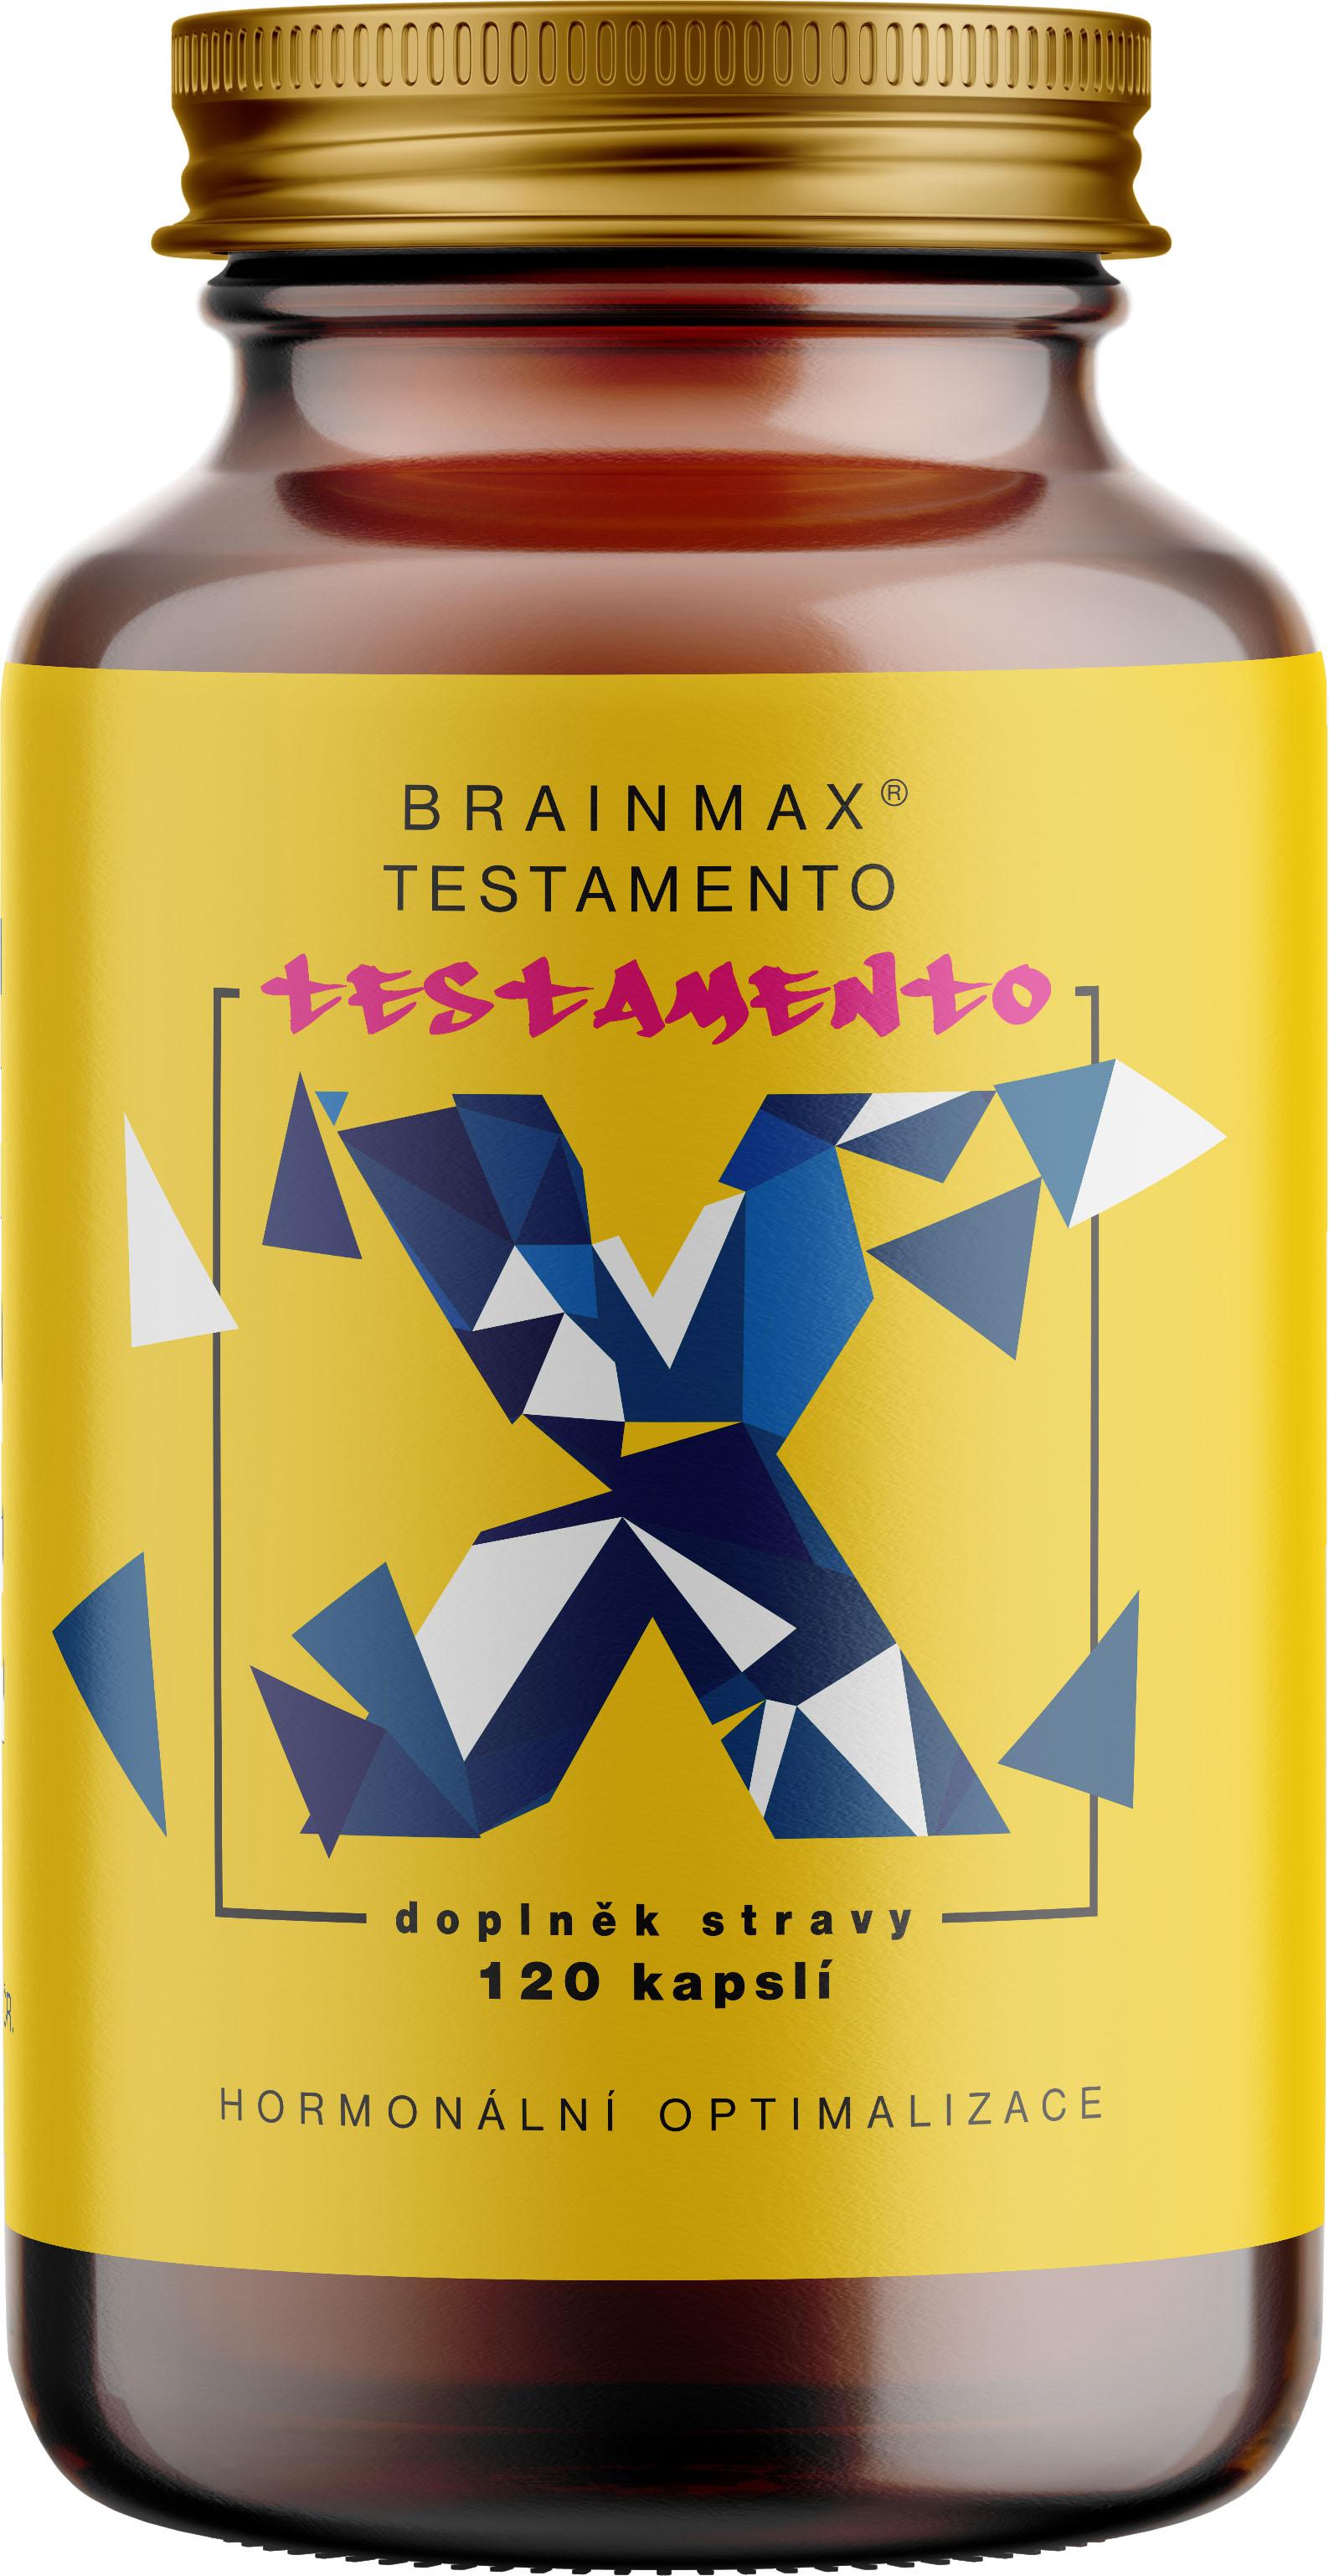 BrainMax Testamento